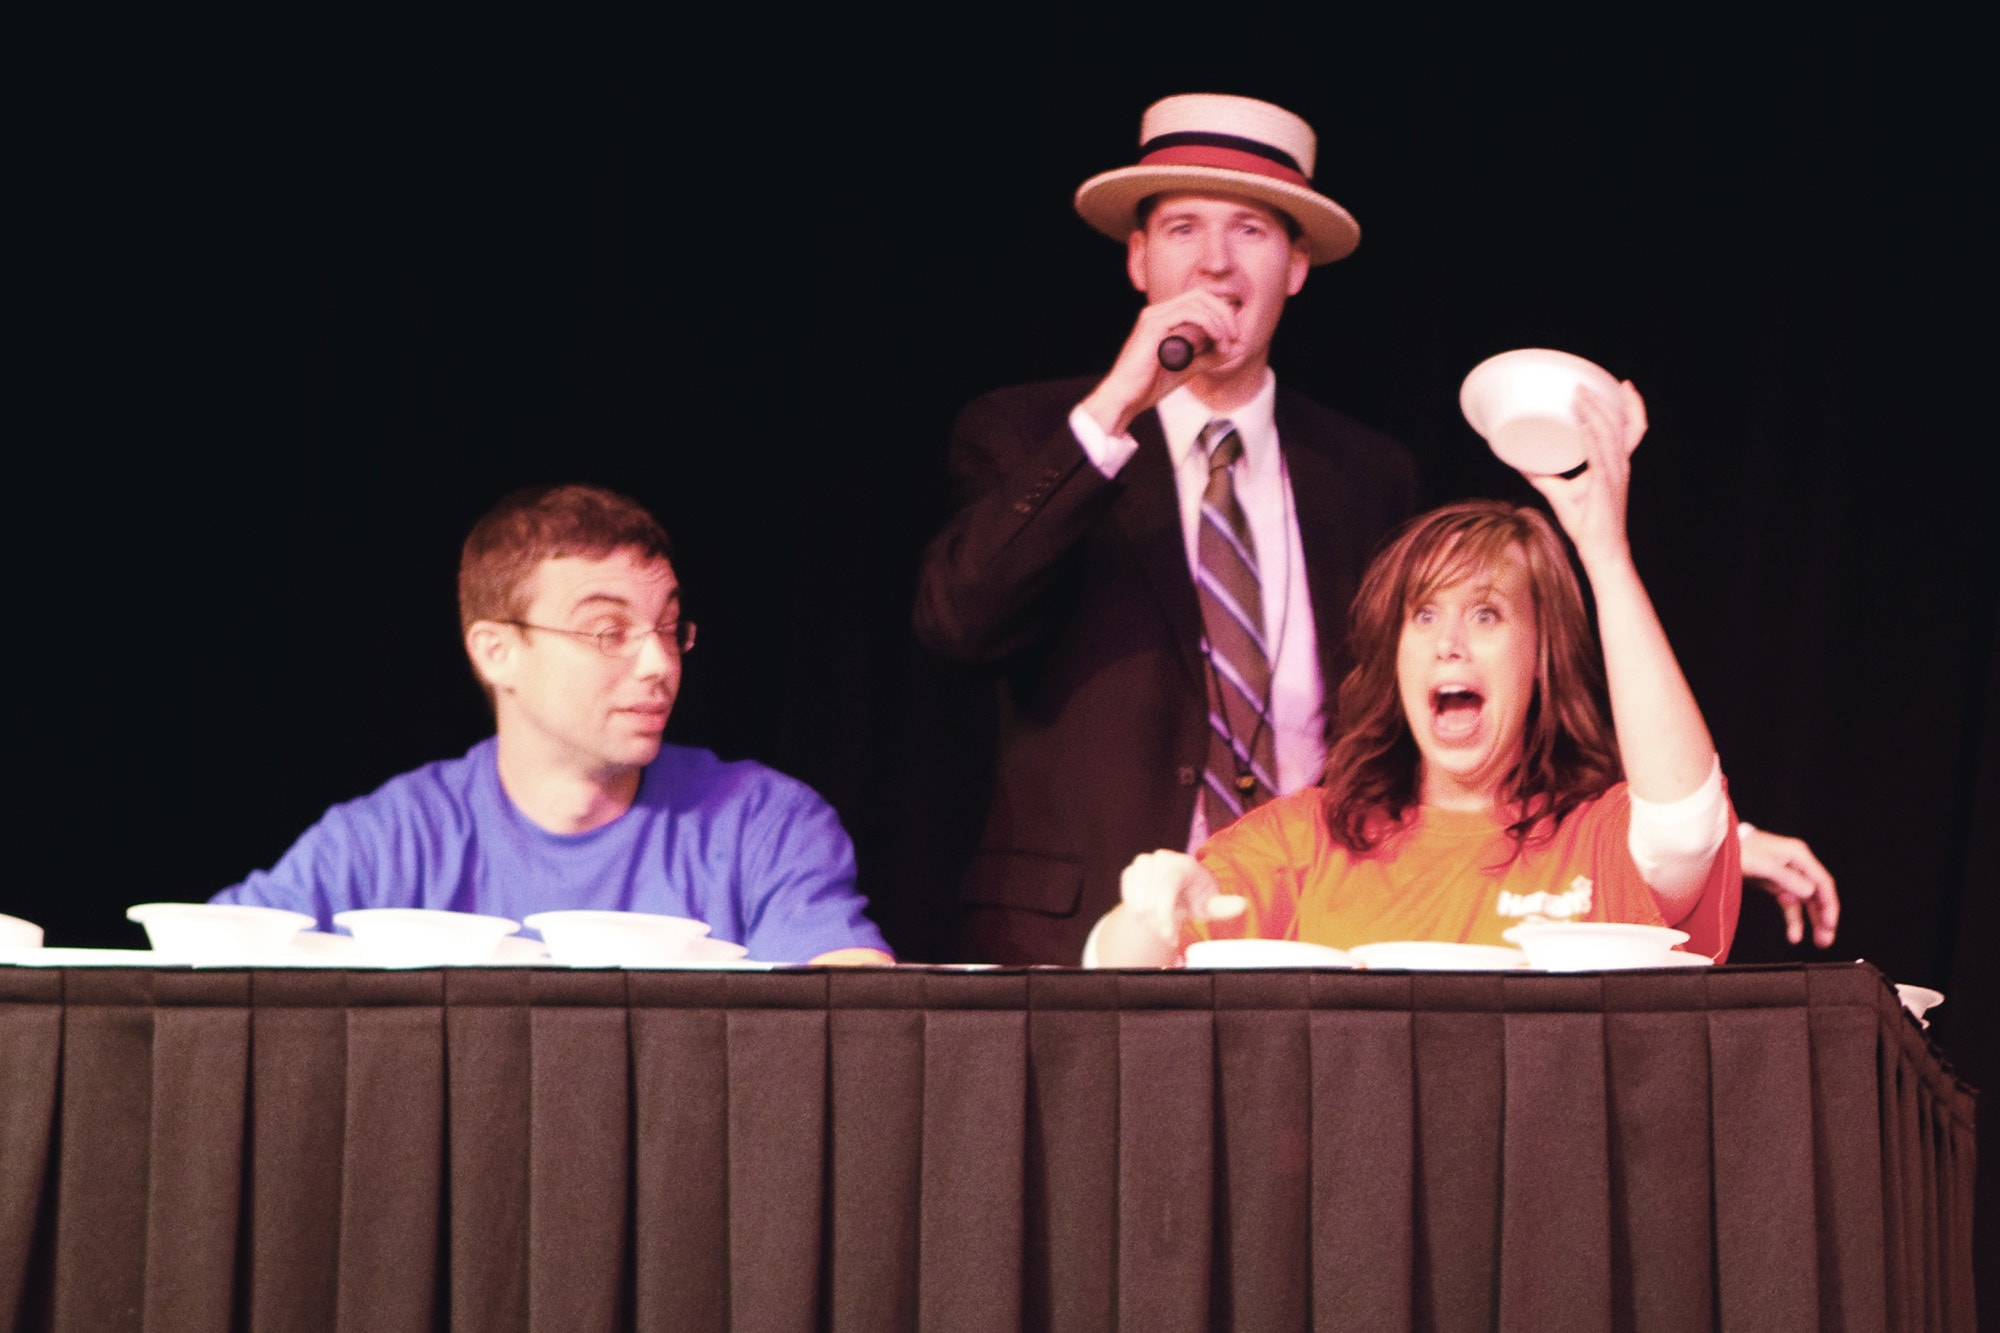 Ice Cream eating contest in Metropolis, Illinois